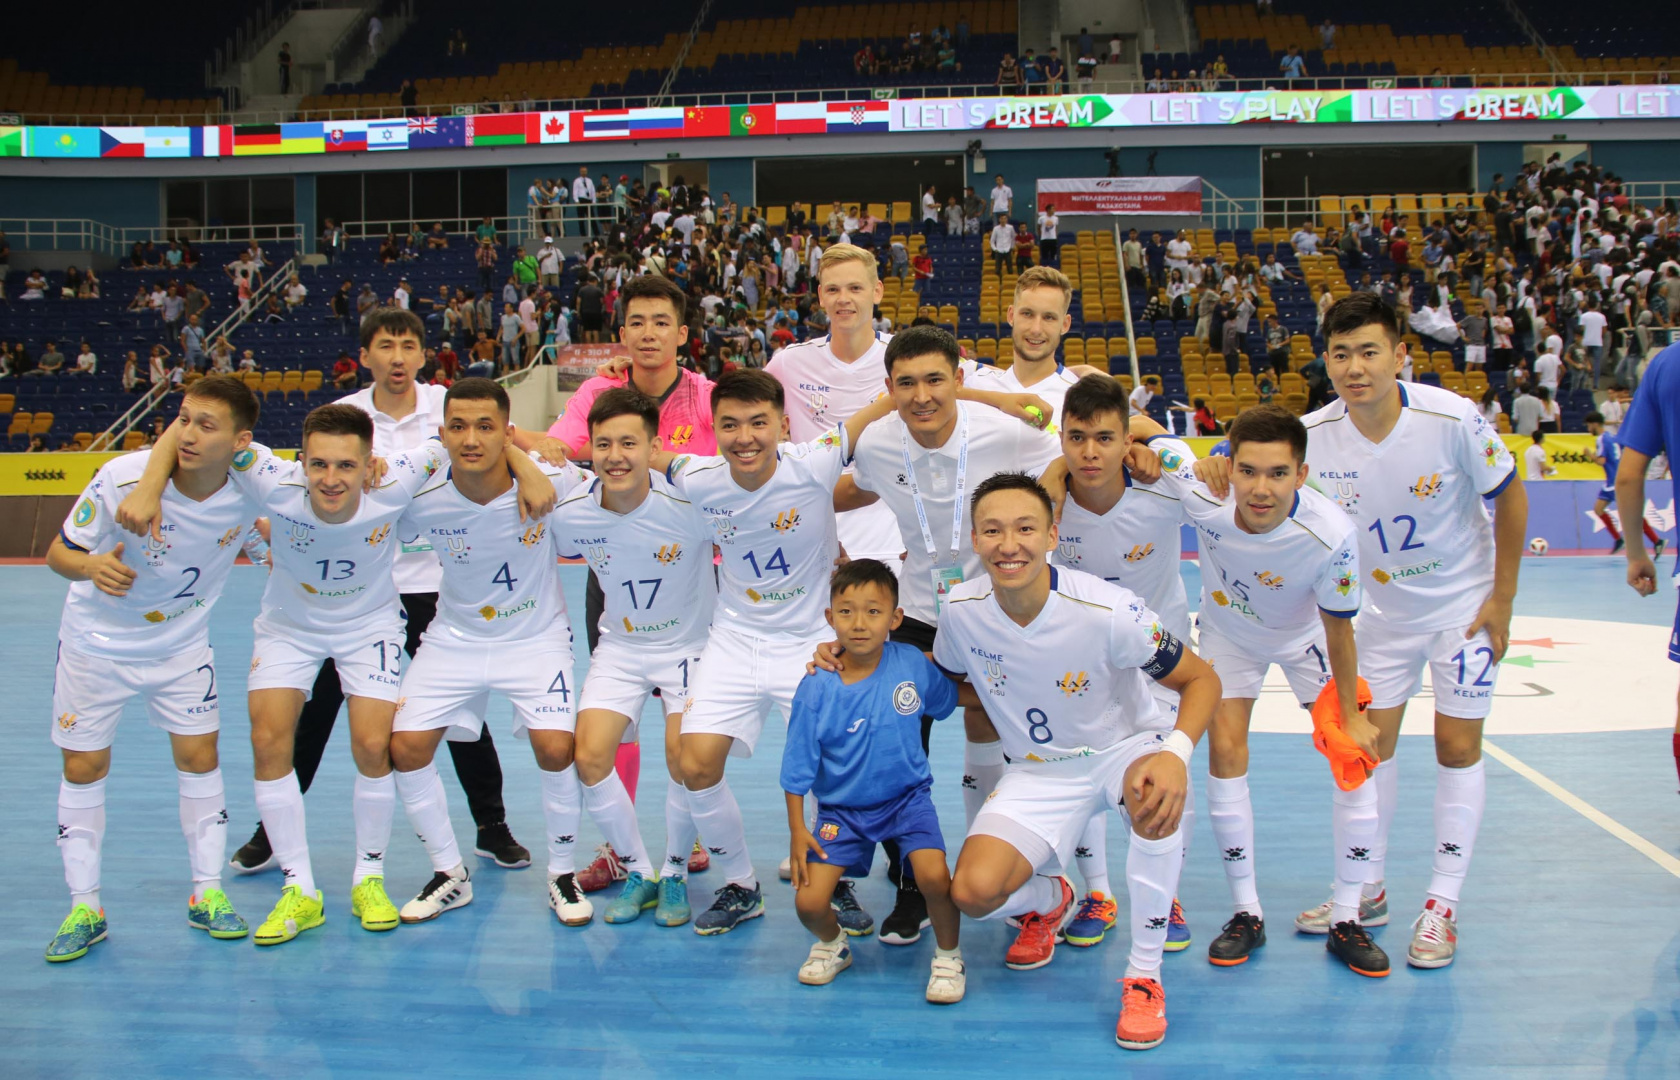 Спорт в казахстане и мире